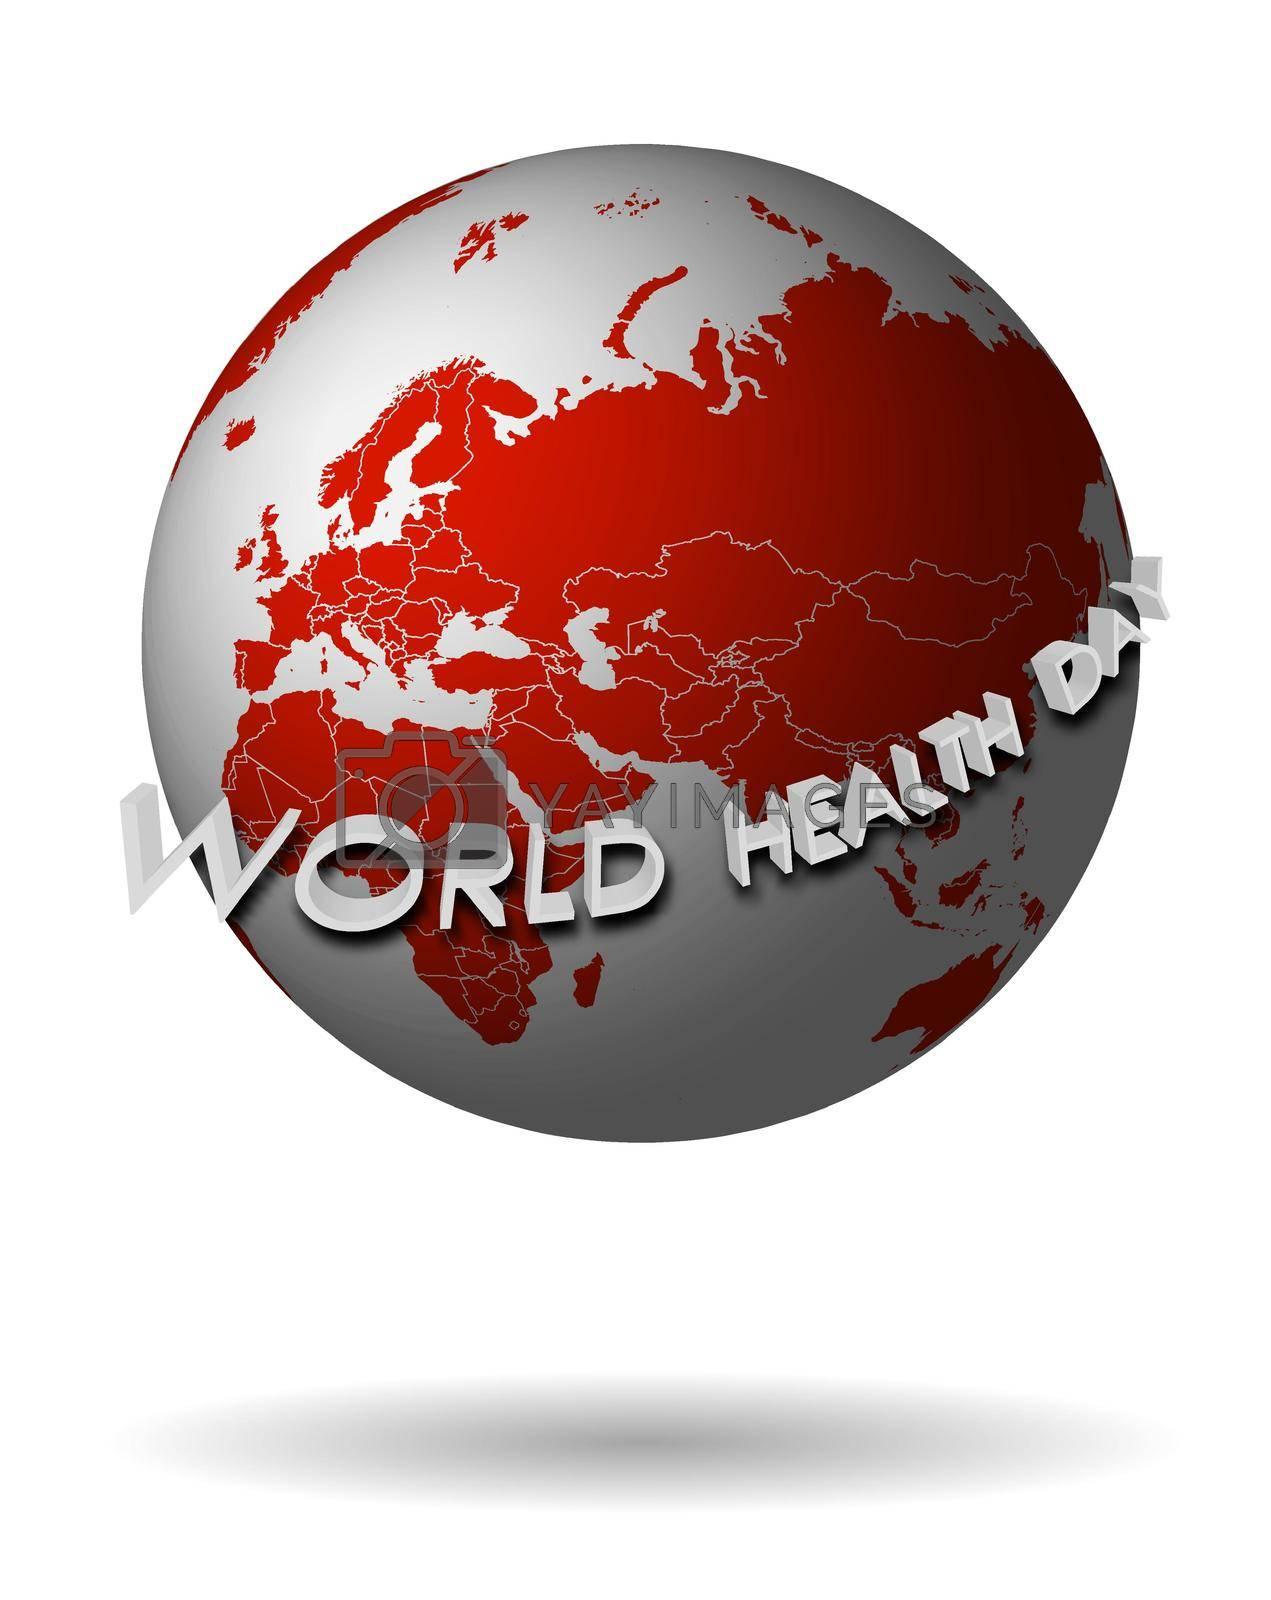 World Health Day logo, banner design template. Vector illustration on transparent background